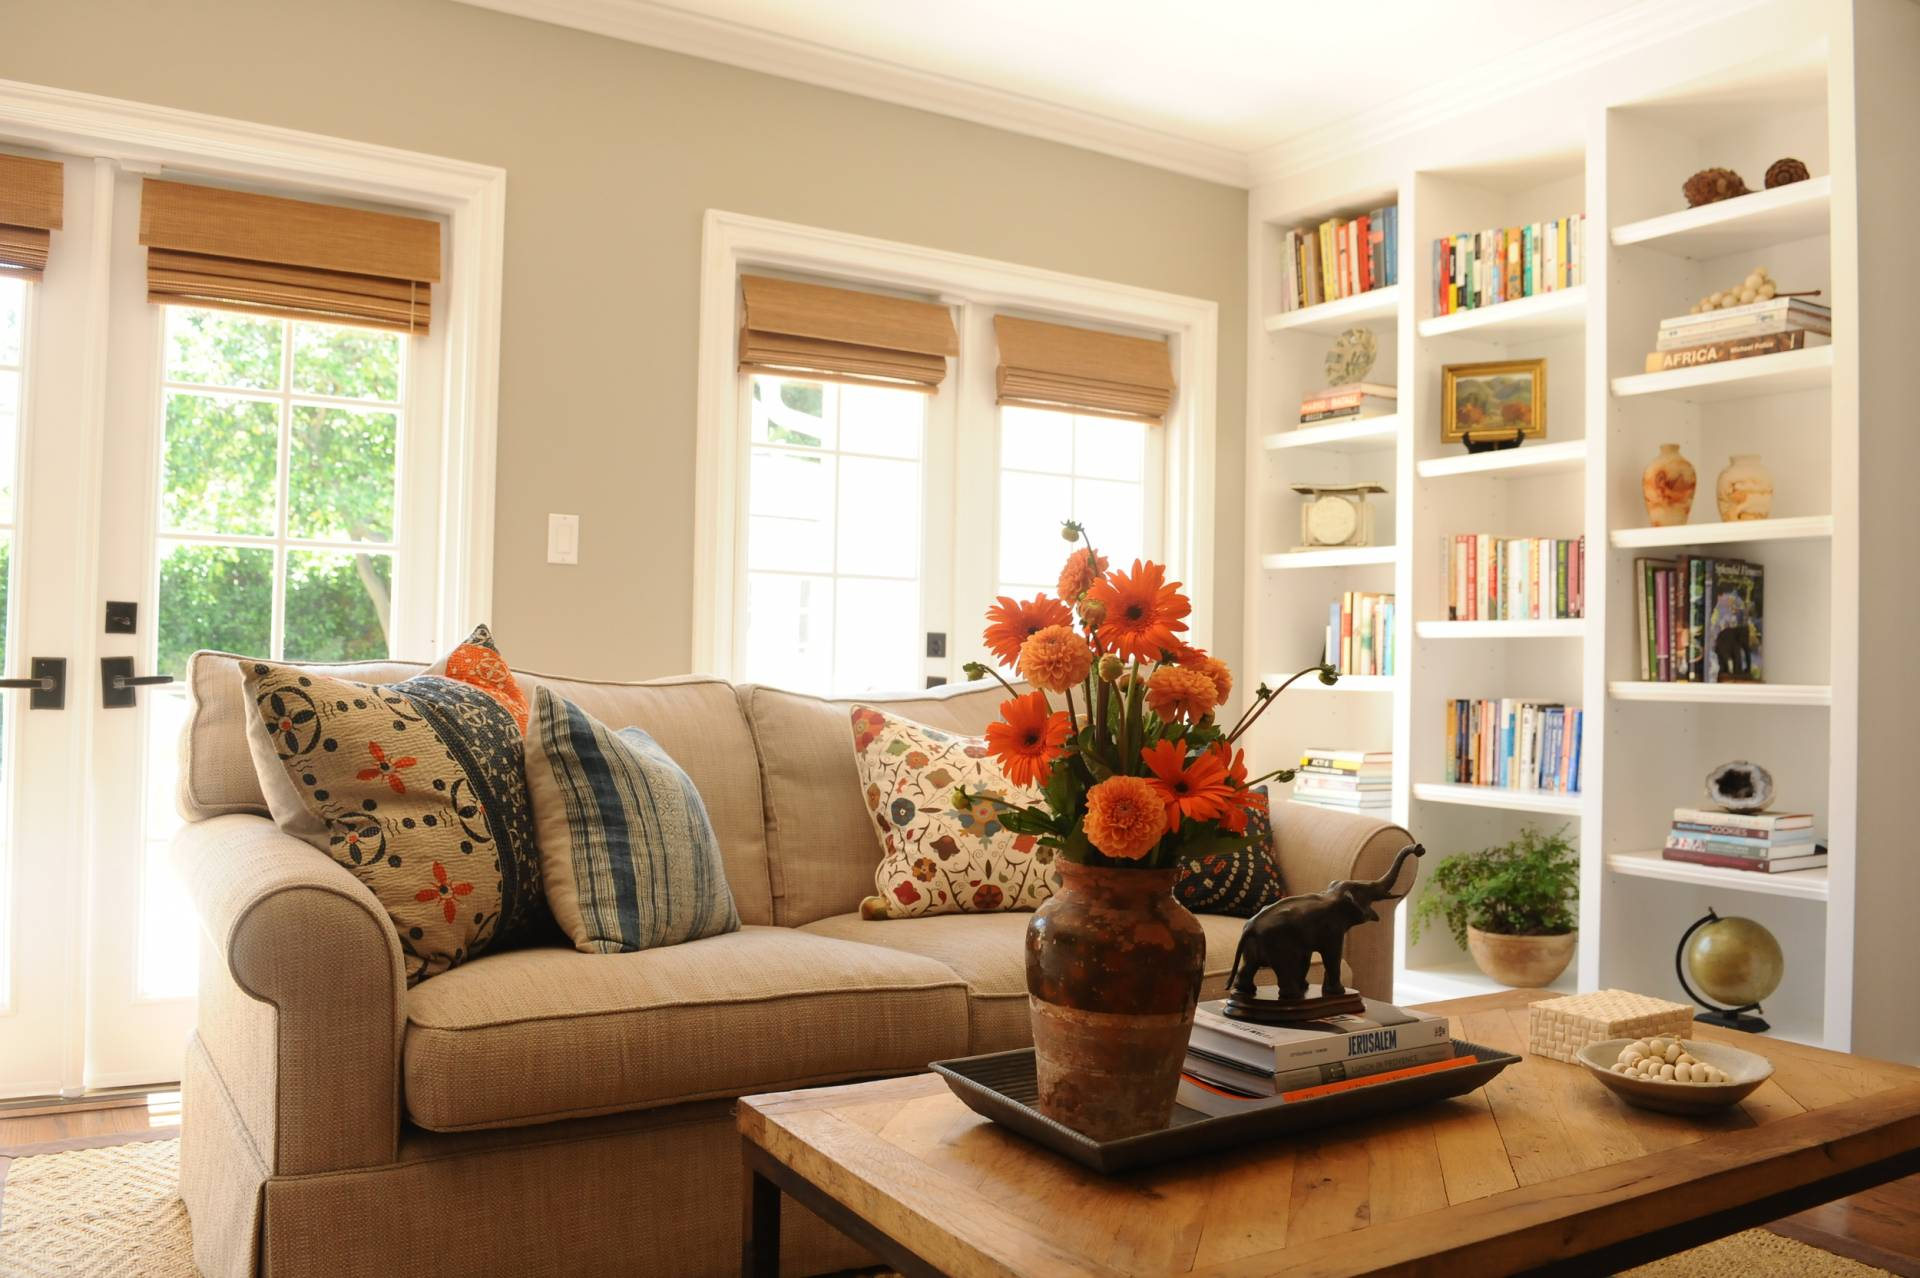 Tan sofa and inside mounted flat woven shades